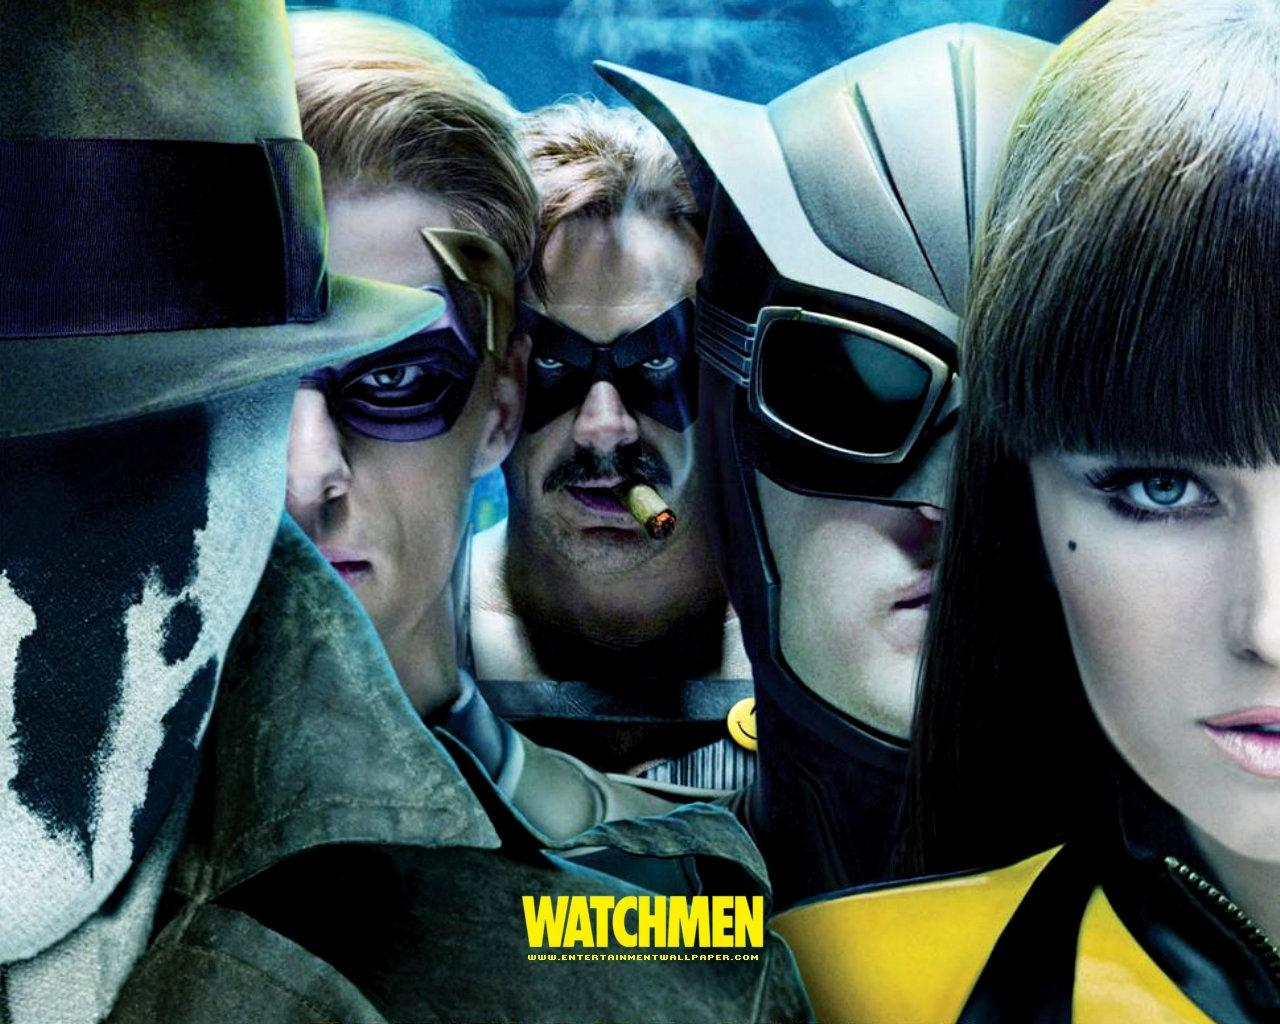 watchmen tv series - HD1280×1024